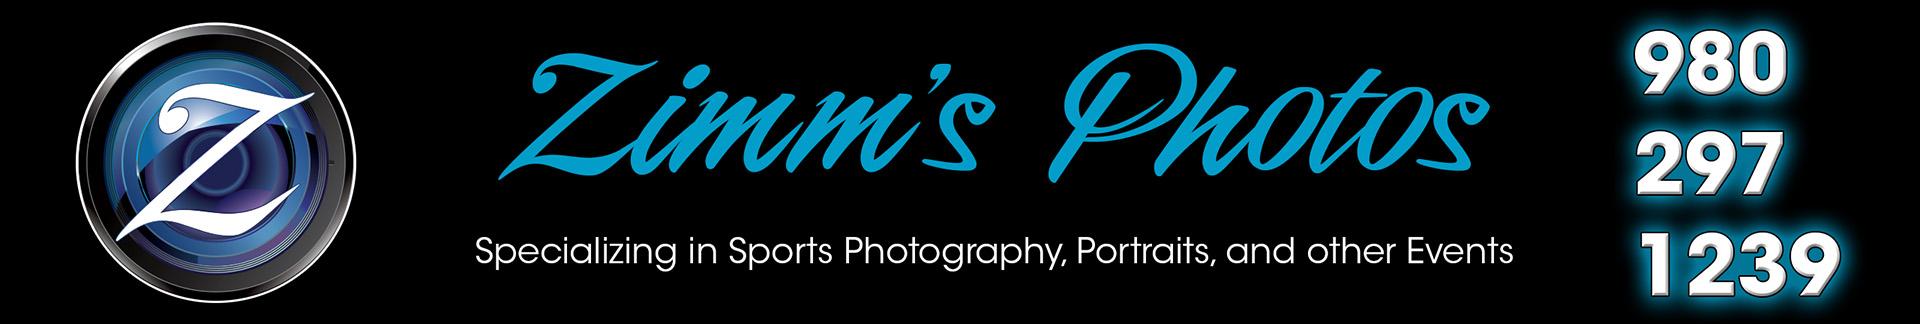 Zimm's Photos Banner